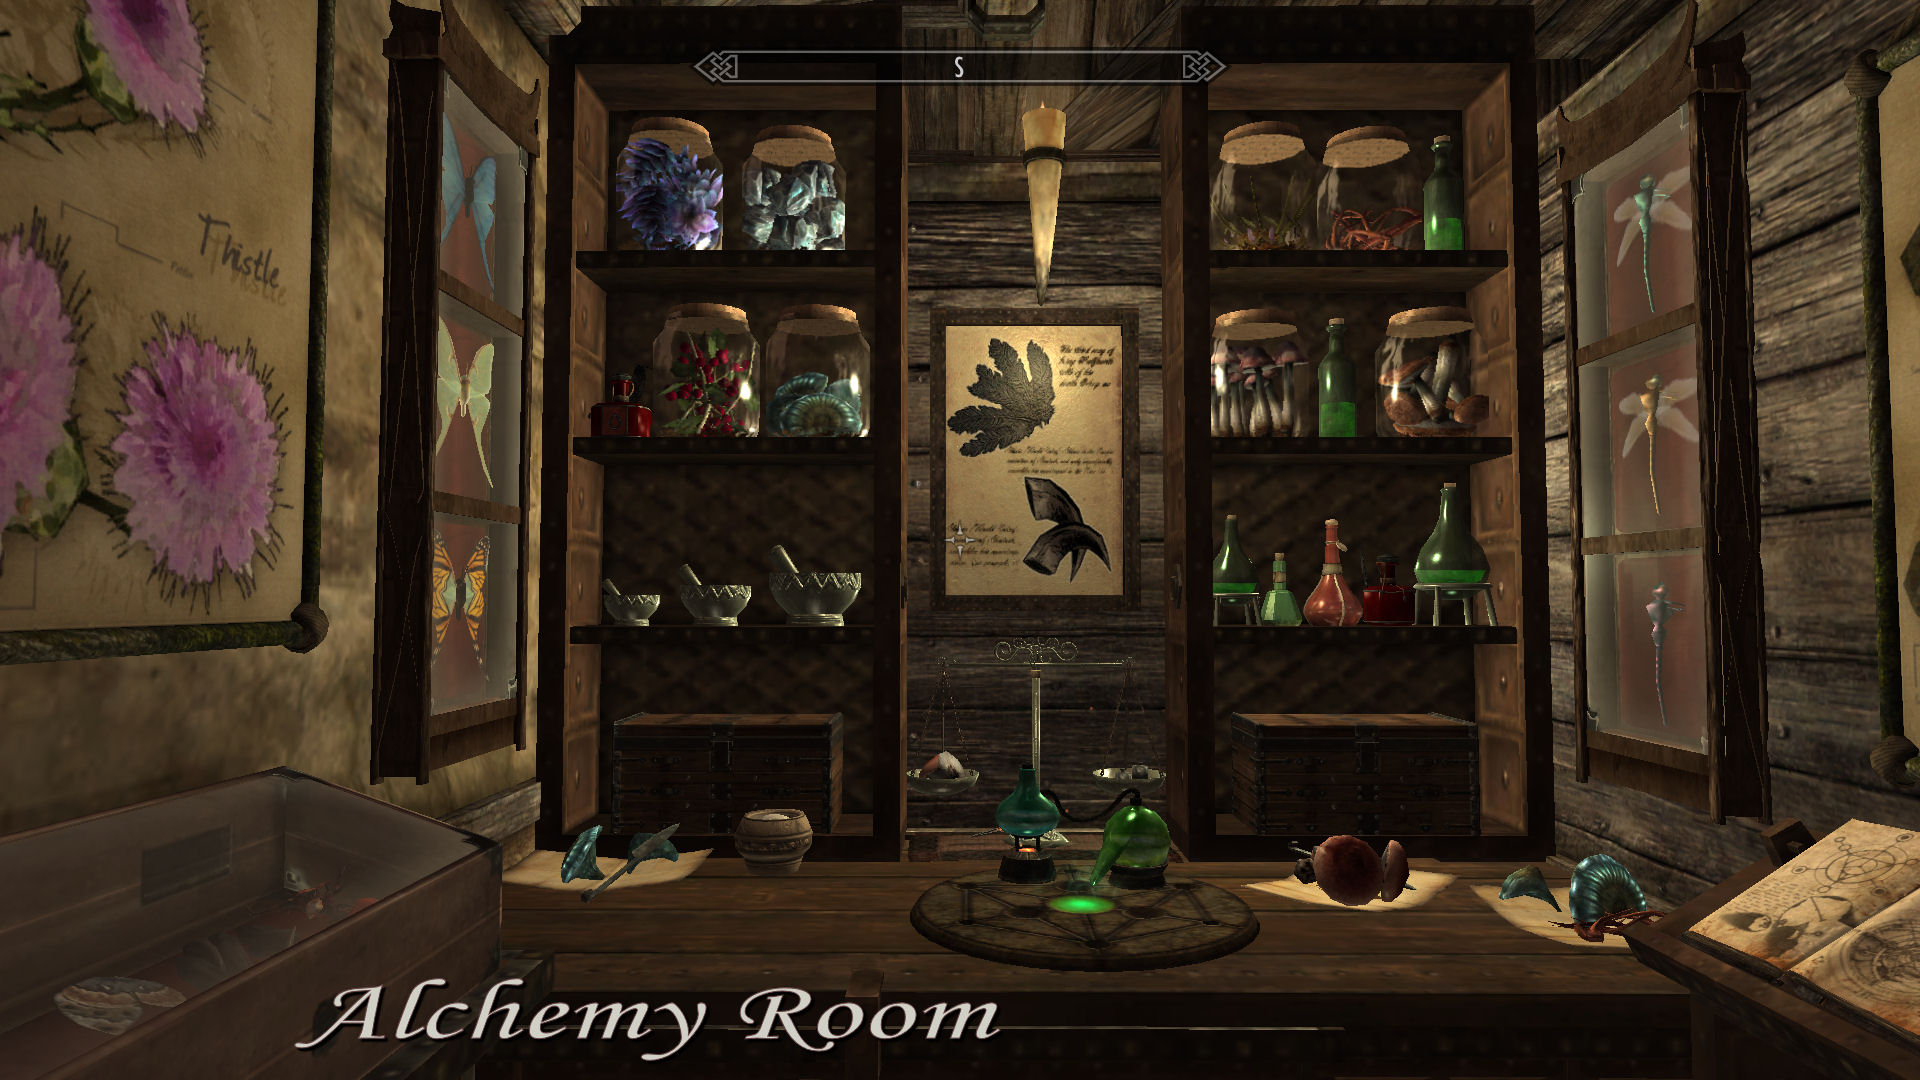 3d Classroom Wallpaper Alchemy Room At Skyrim Nexus Mods And Community